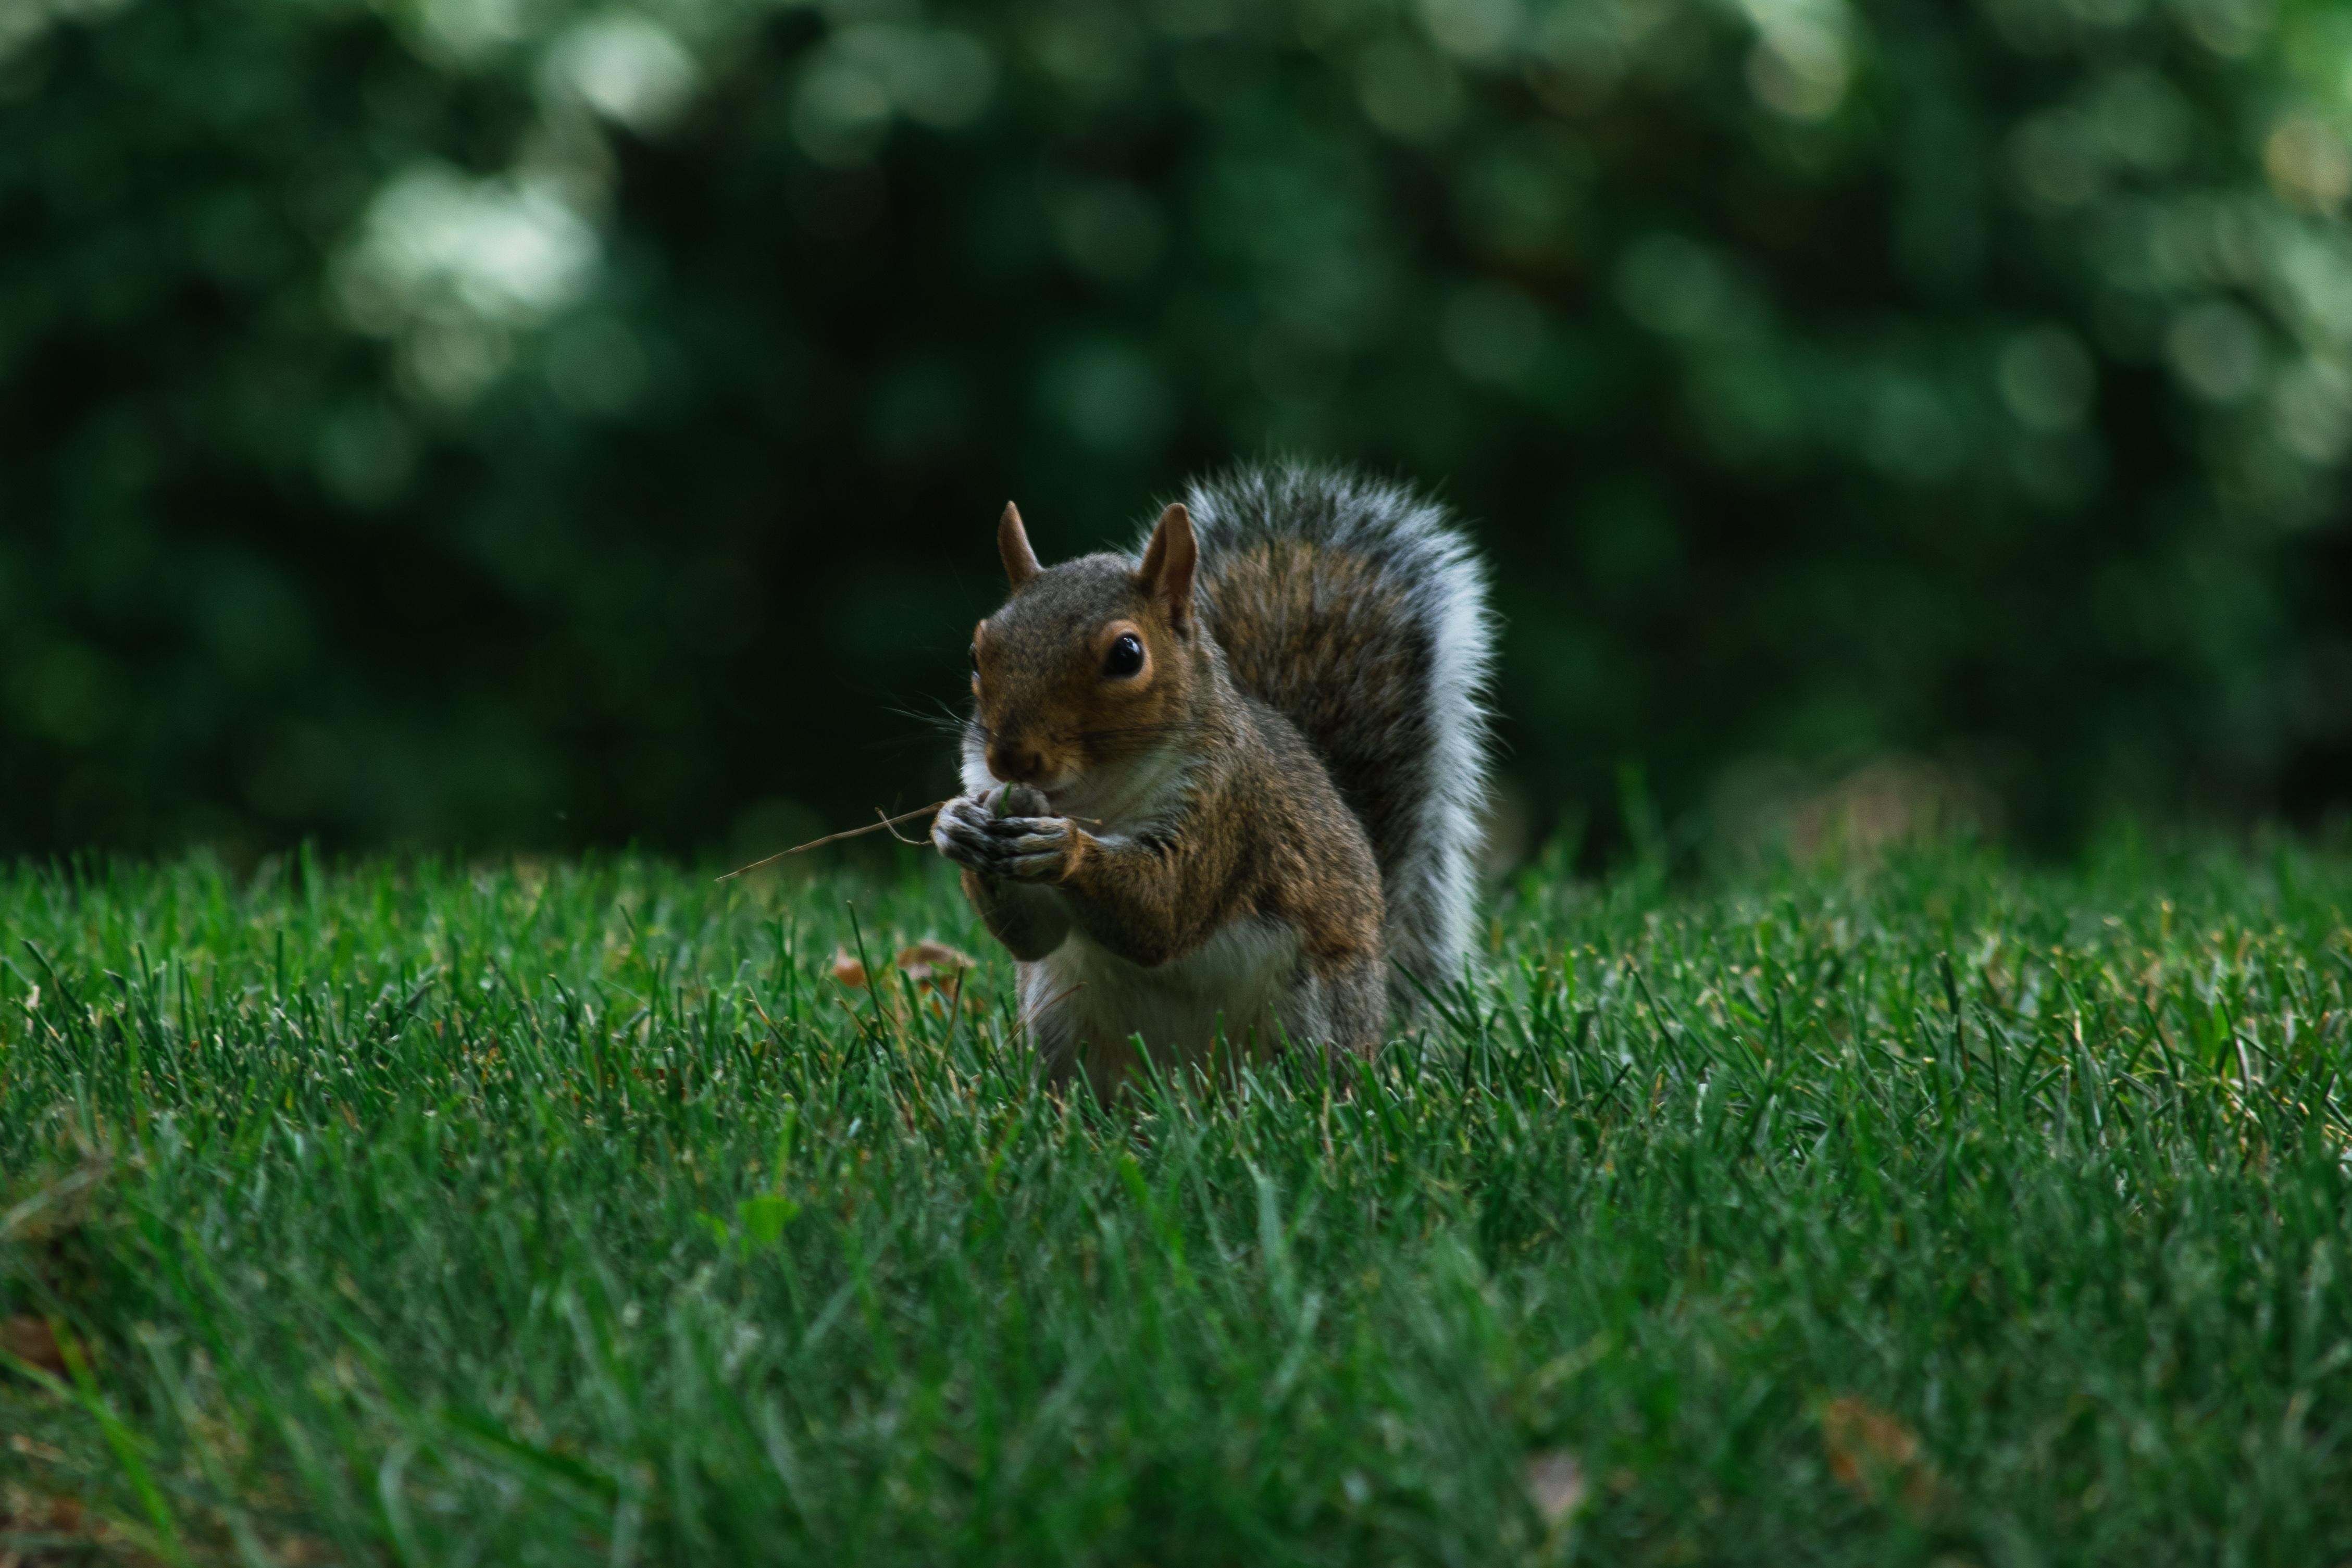 features_squirrel3_griffin